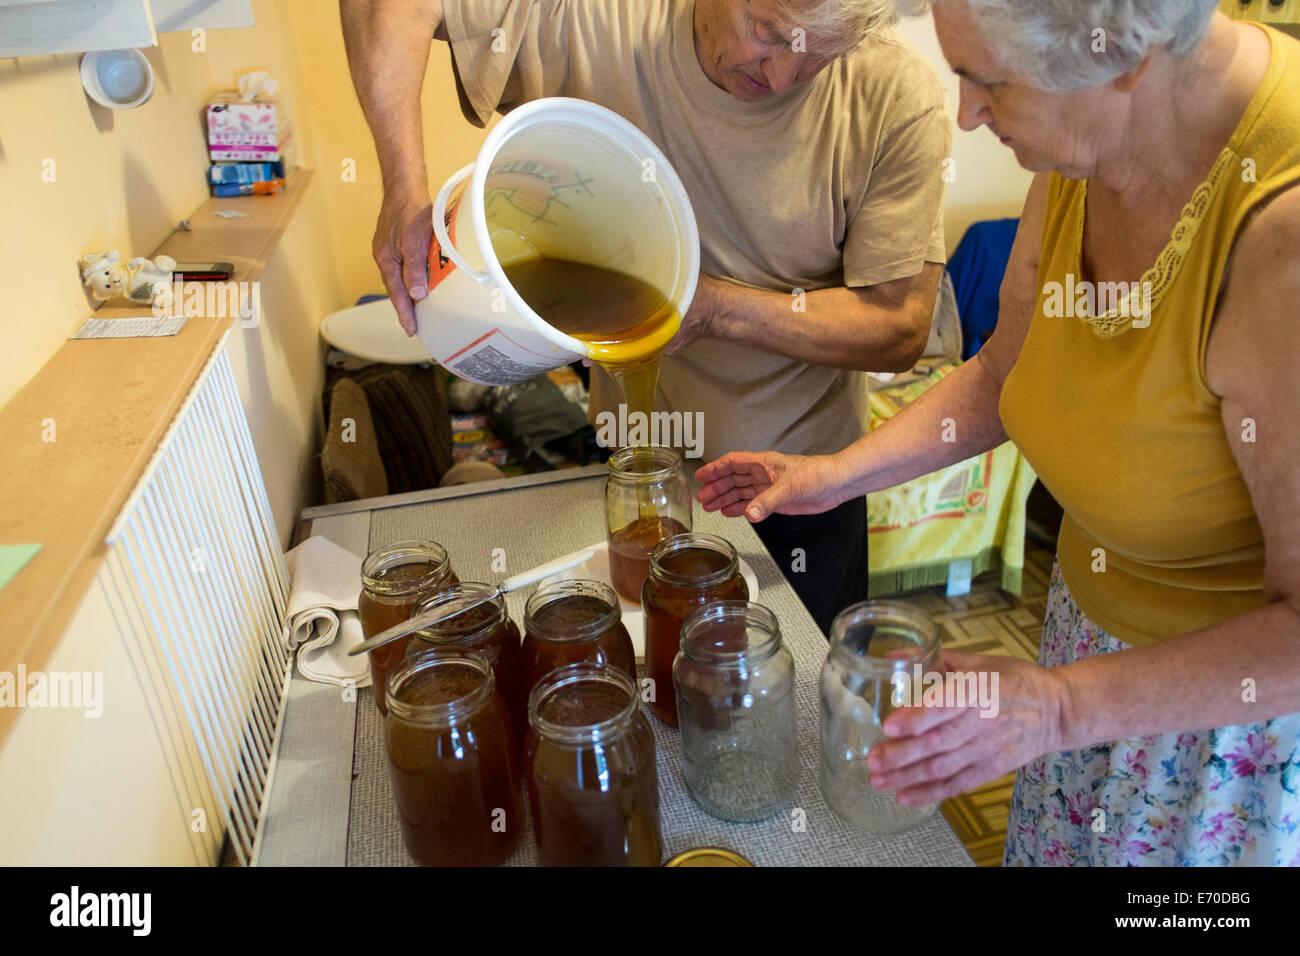 Family run apiary in rural Poland - Stock Image